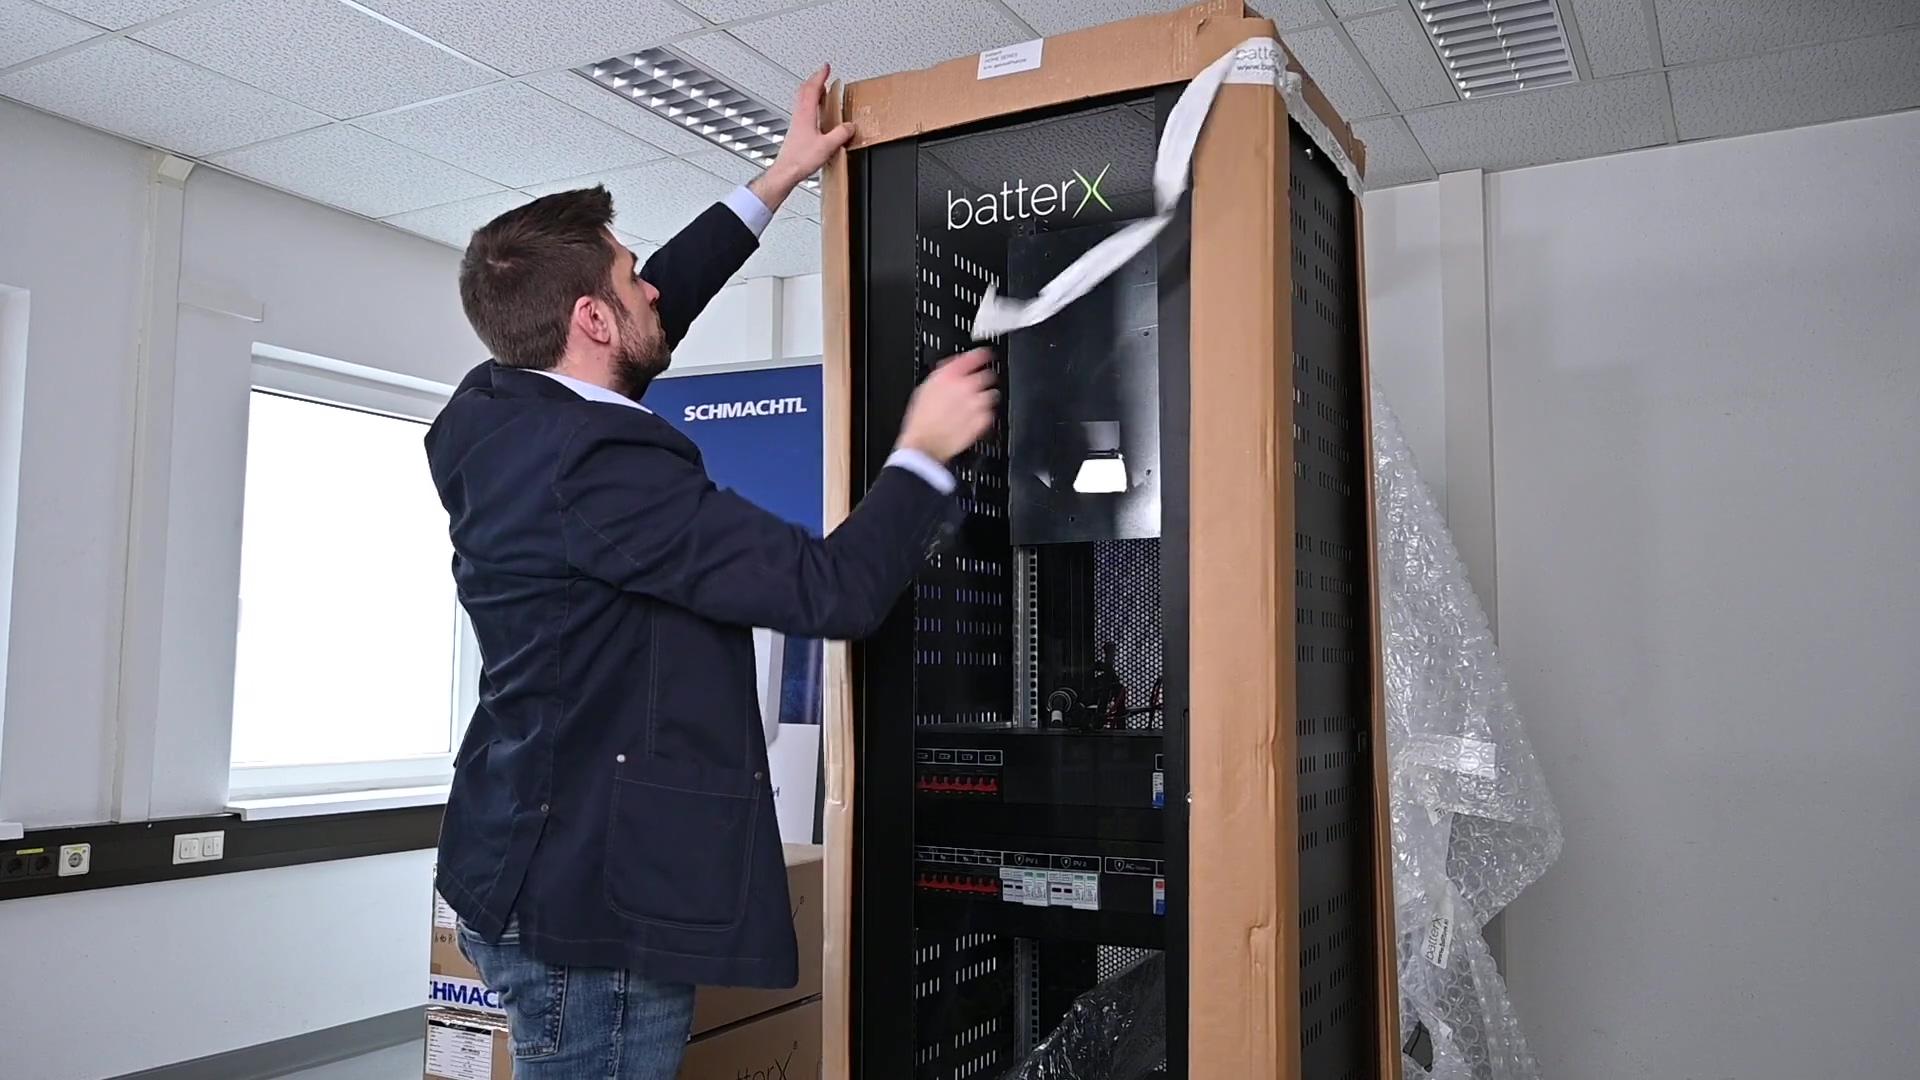 BatterX Inbetriebnahme